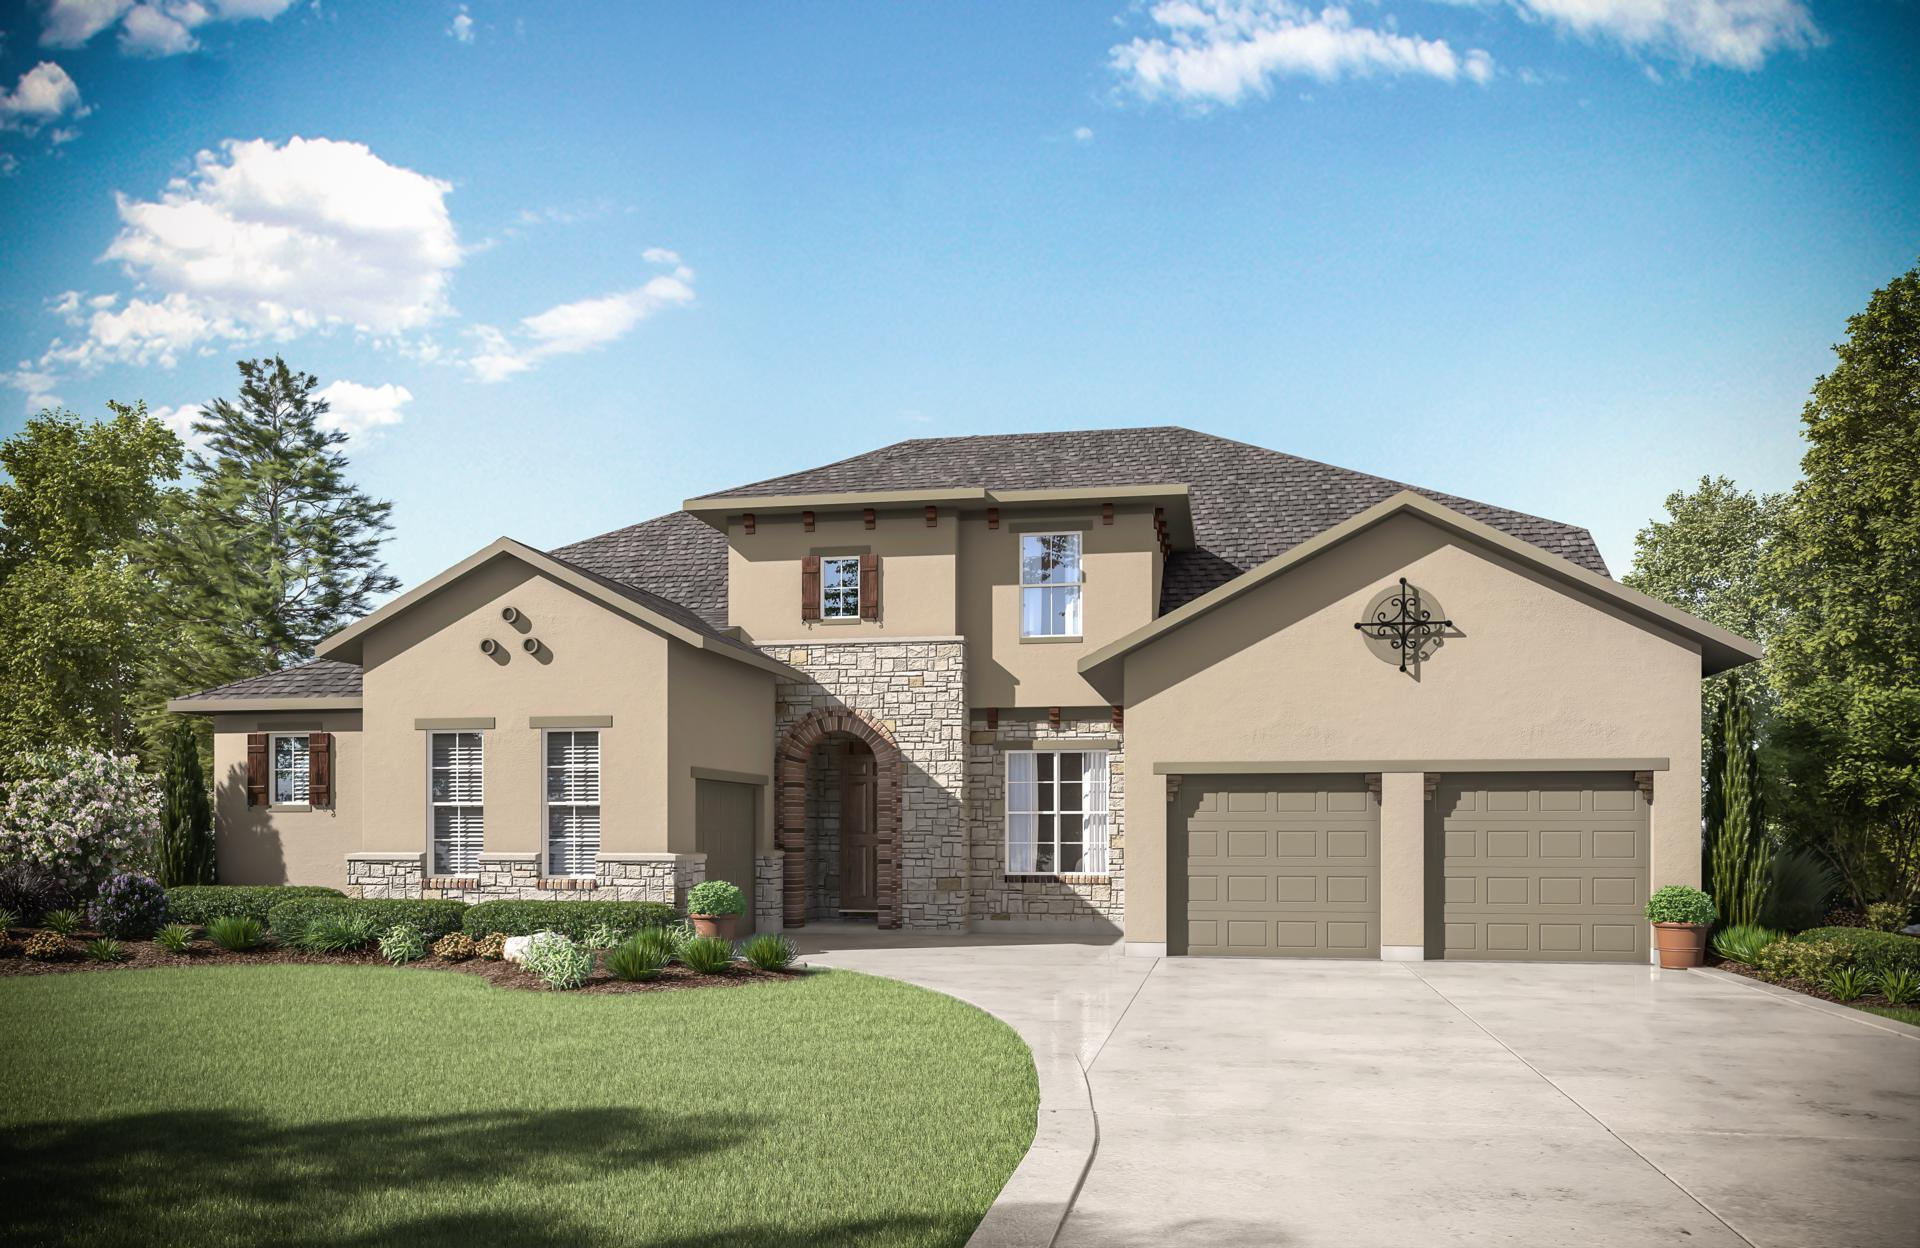 Single Family for Sale at Royal Brook At Kingwood - Grantley 3306 Lockridge Harbor Lane Porter, Texas 77365 United States